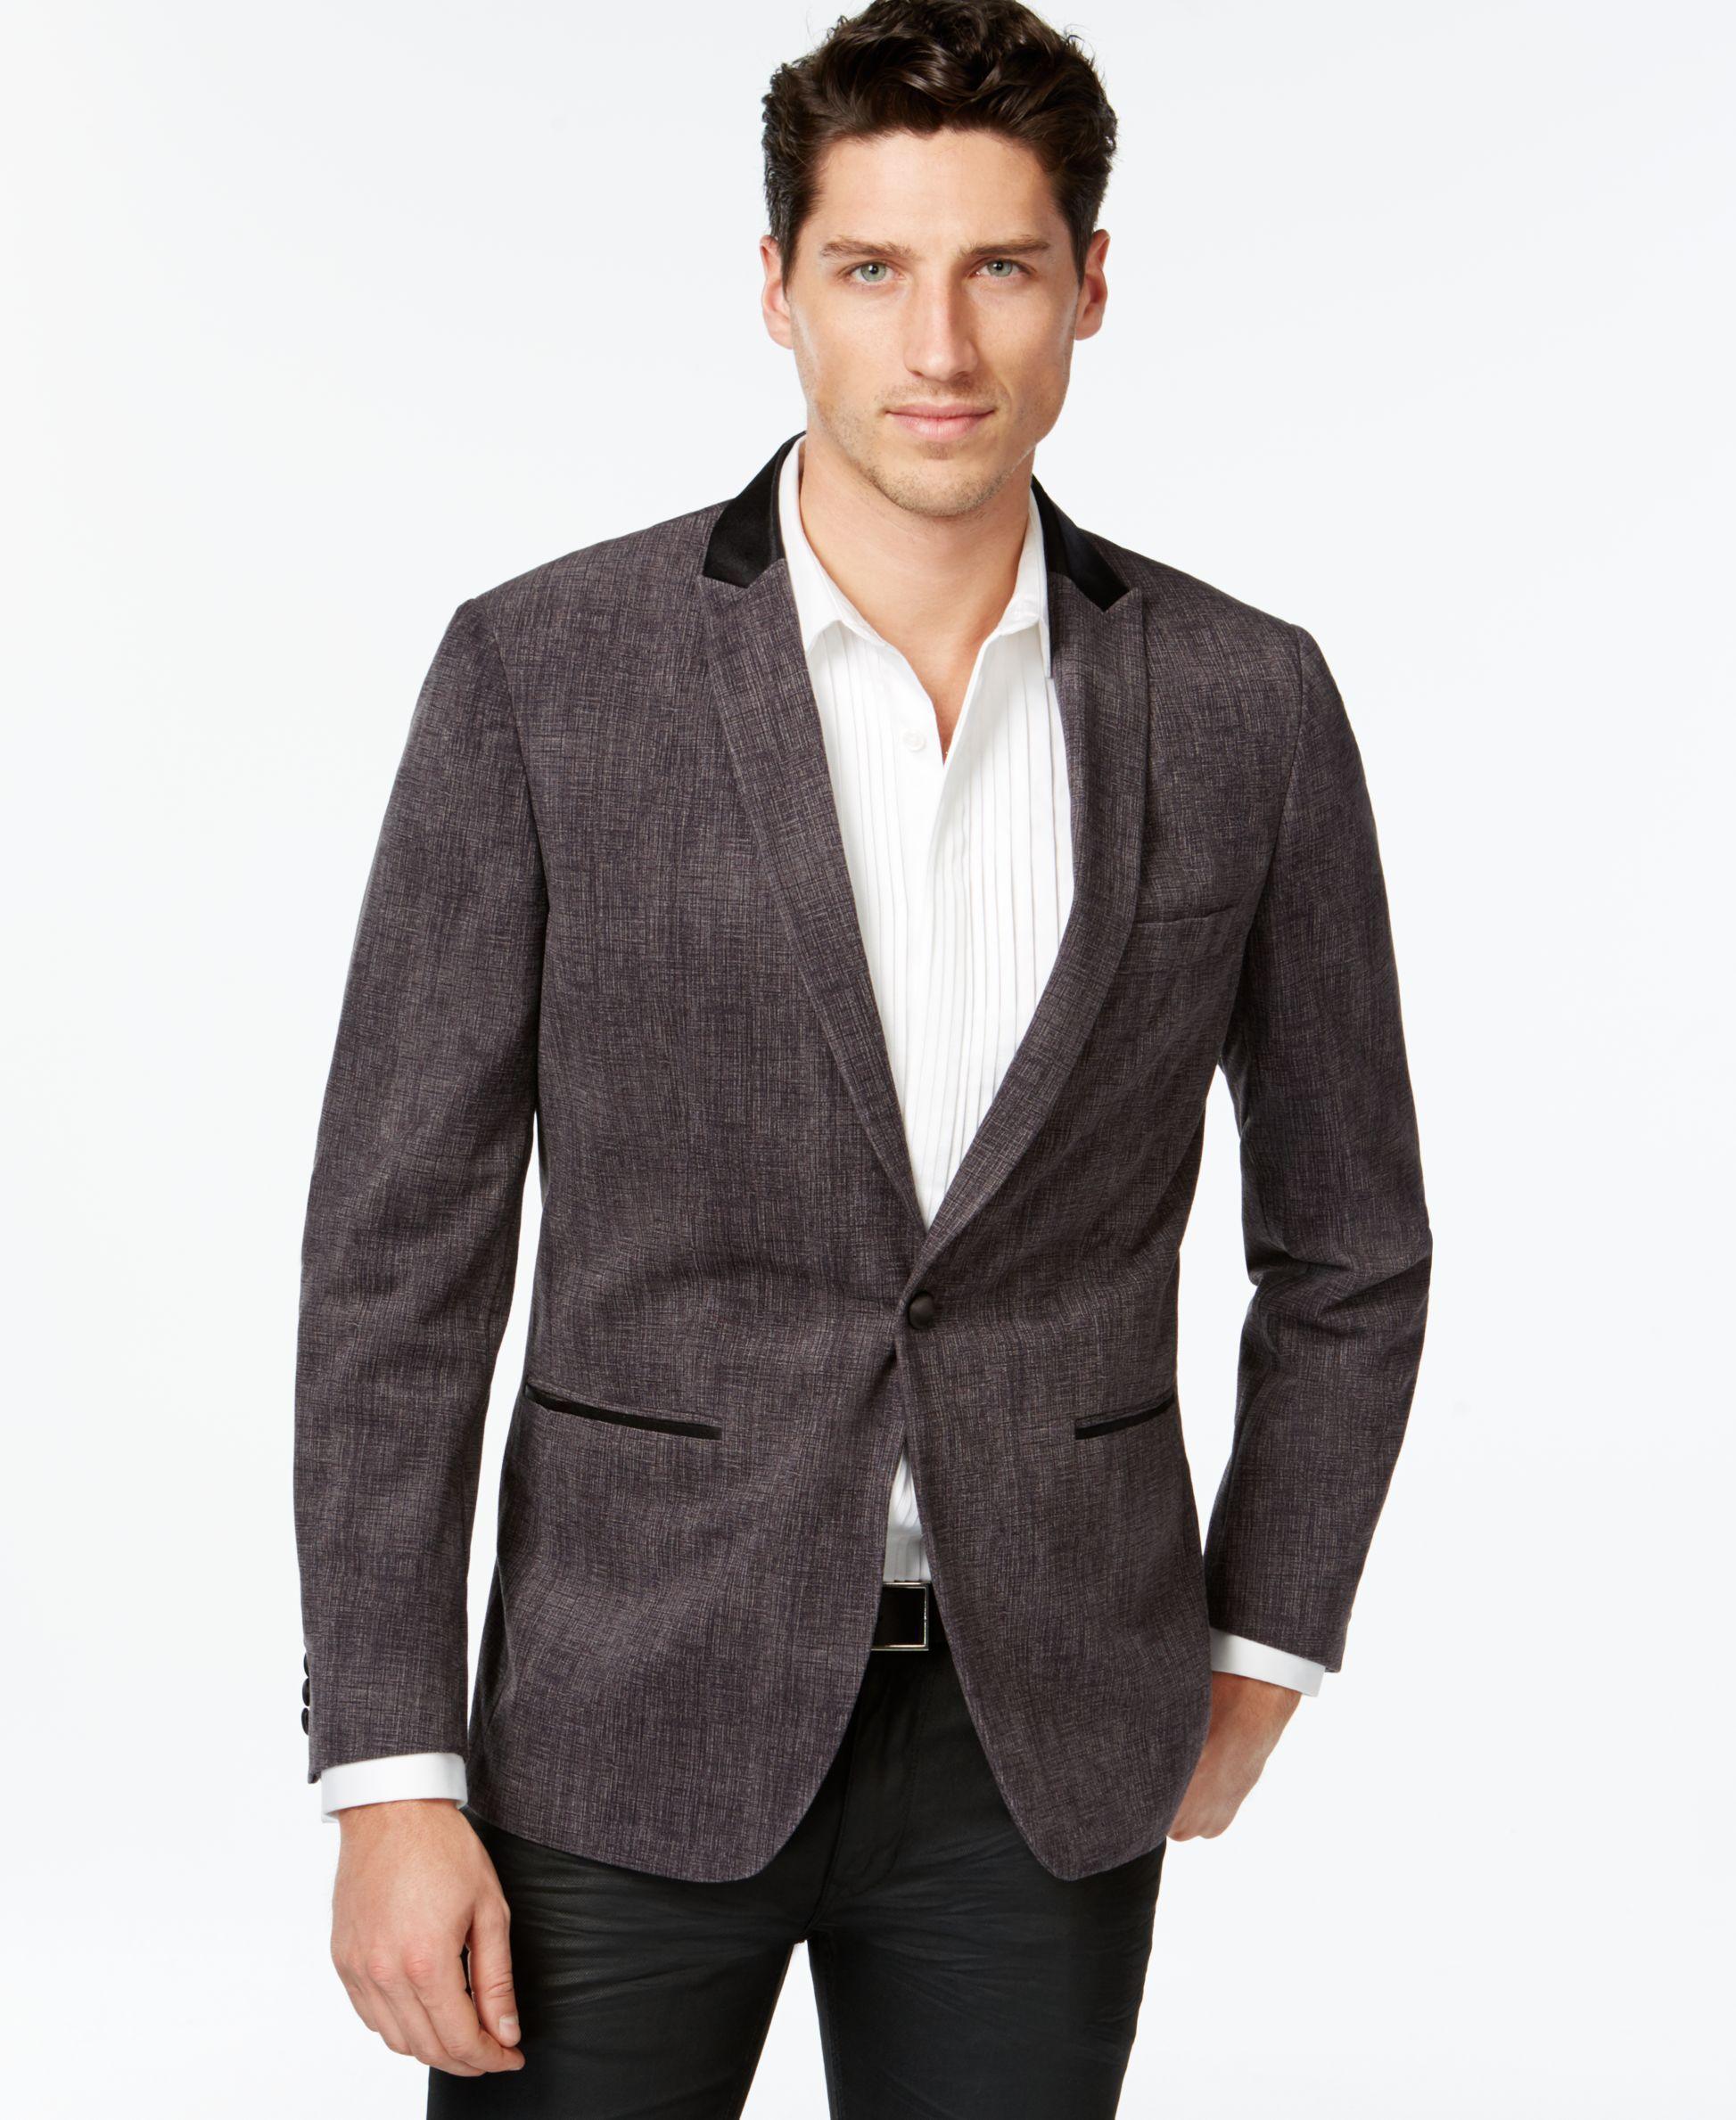 eabee717fa014 Inc International Concepts Jasper Slim-Fit Blazer